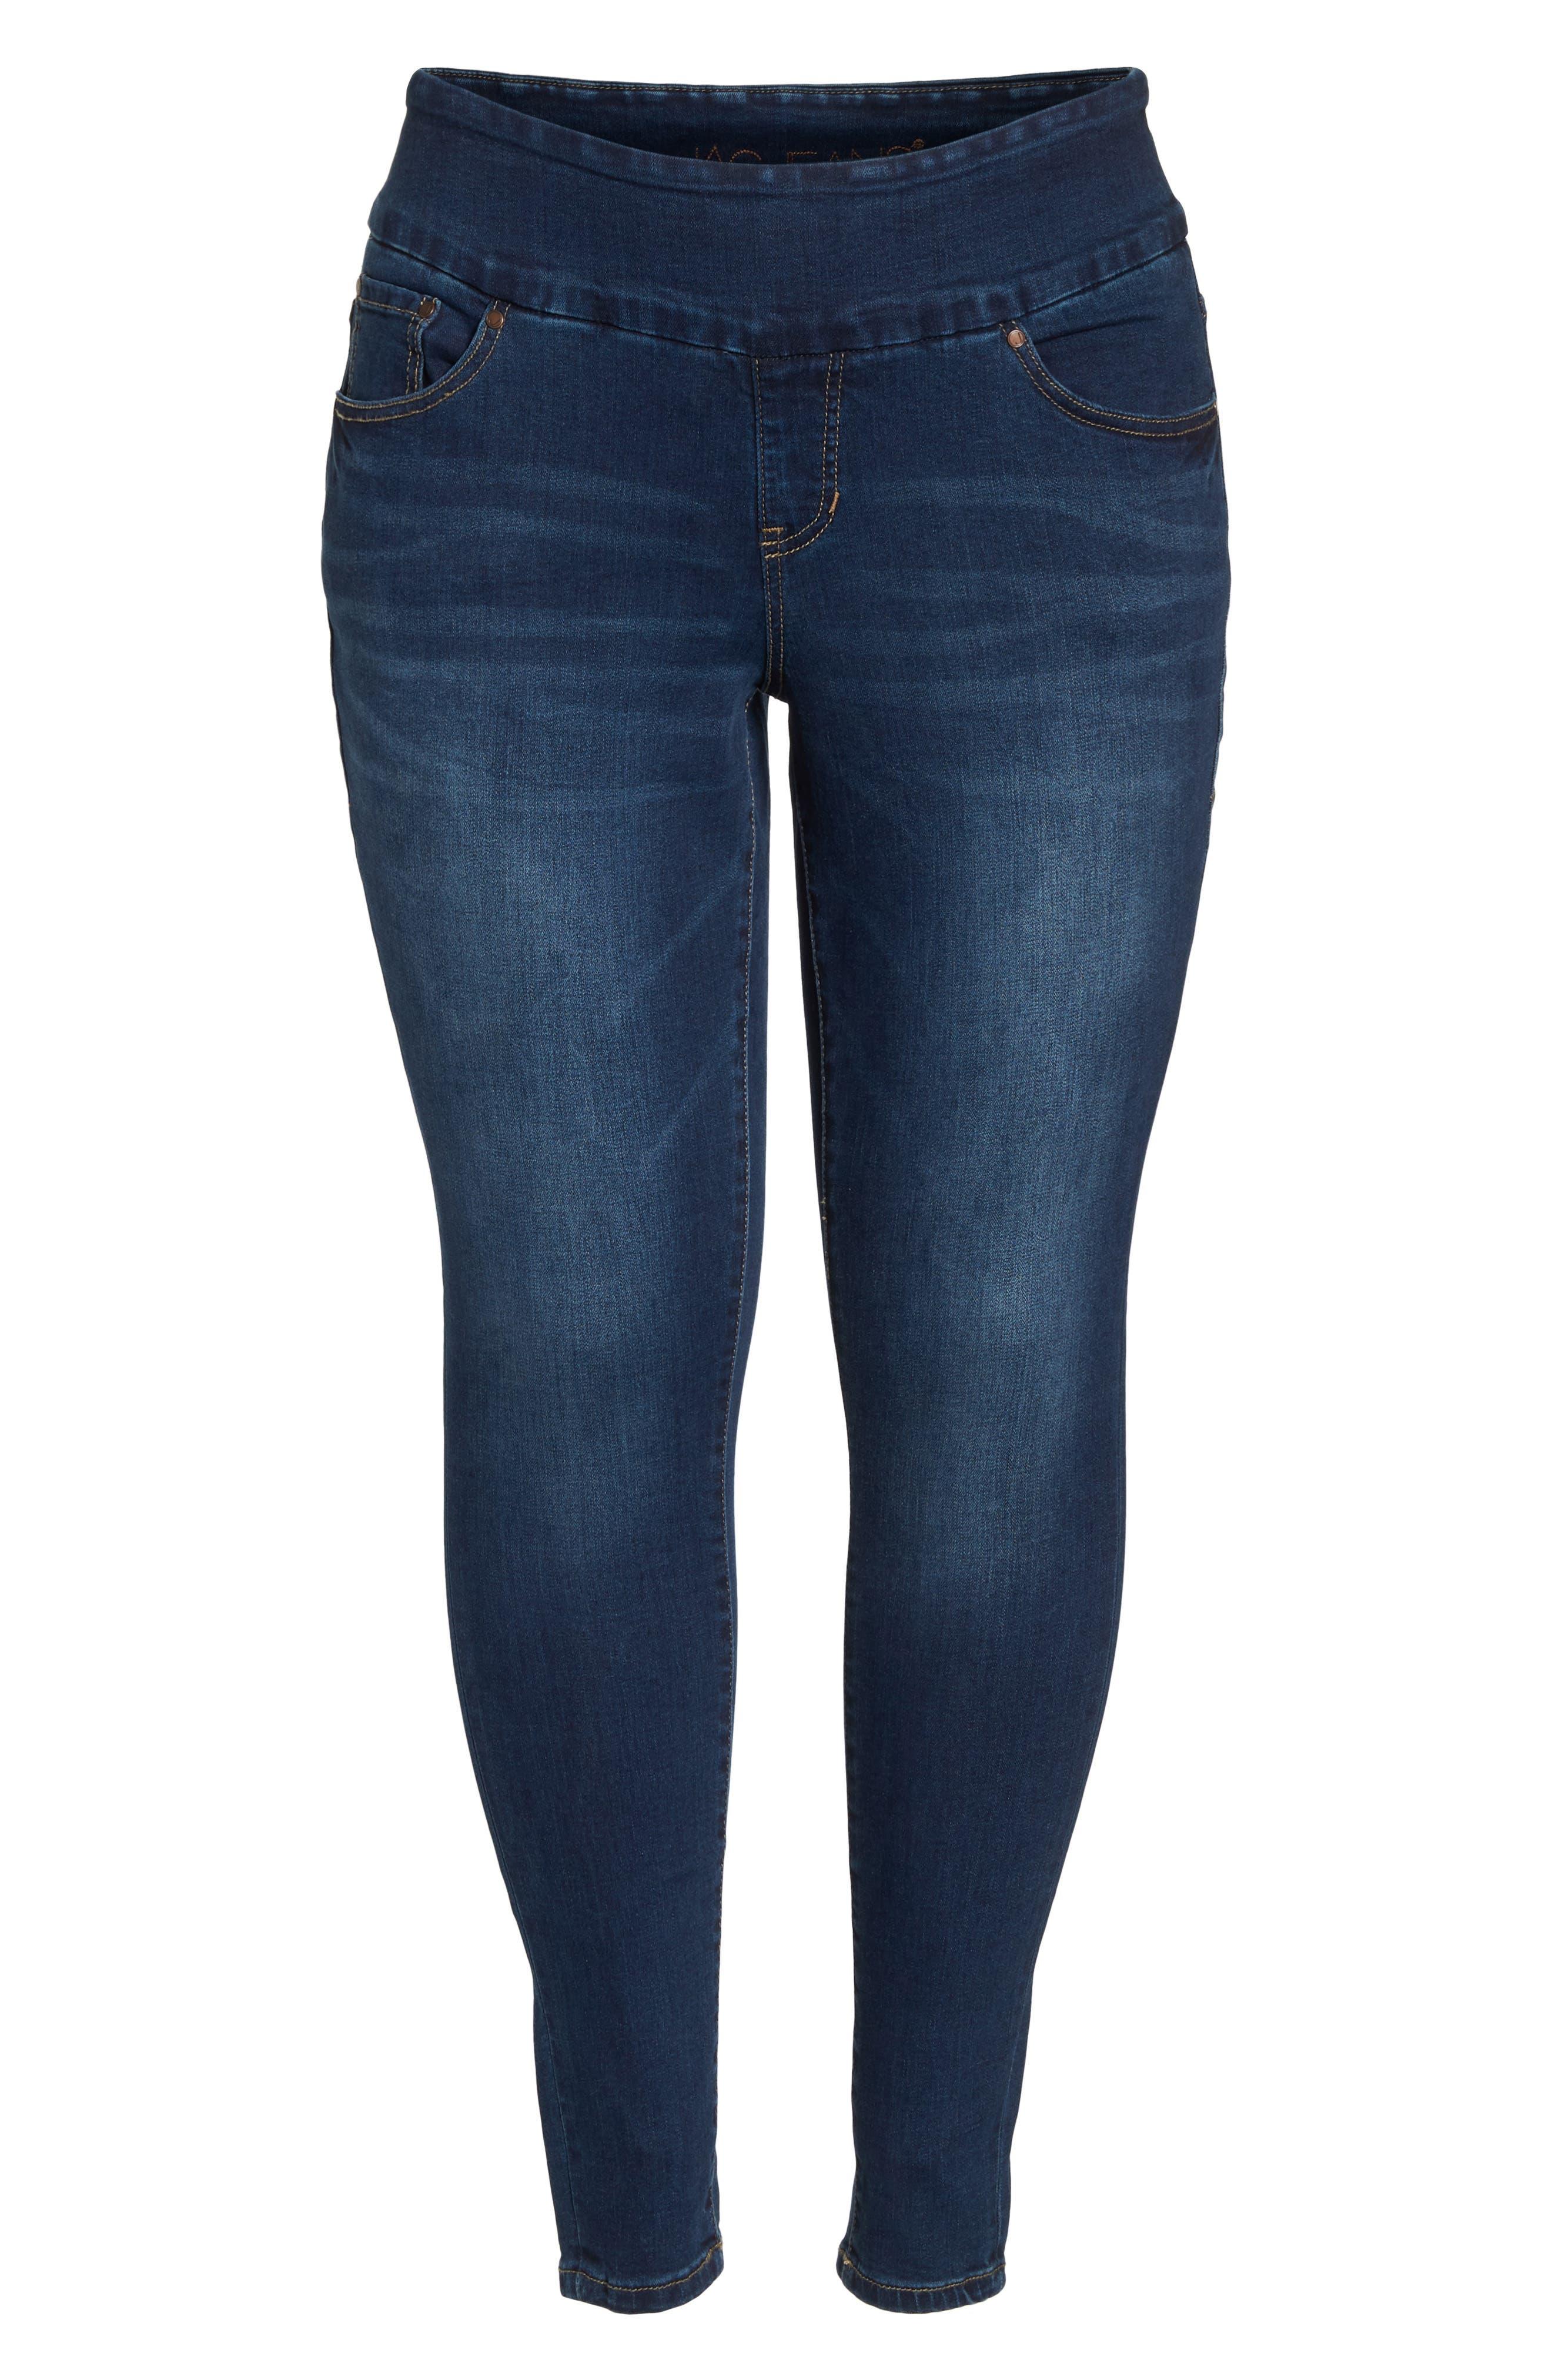 Nora Stretch Skinny Jeans,                             Alternate thumbnail 7, color,                             MED INDIGO